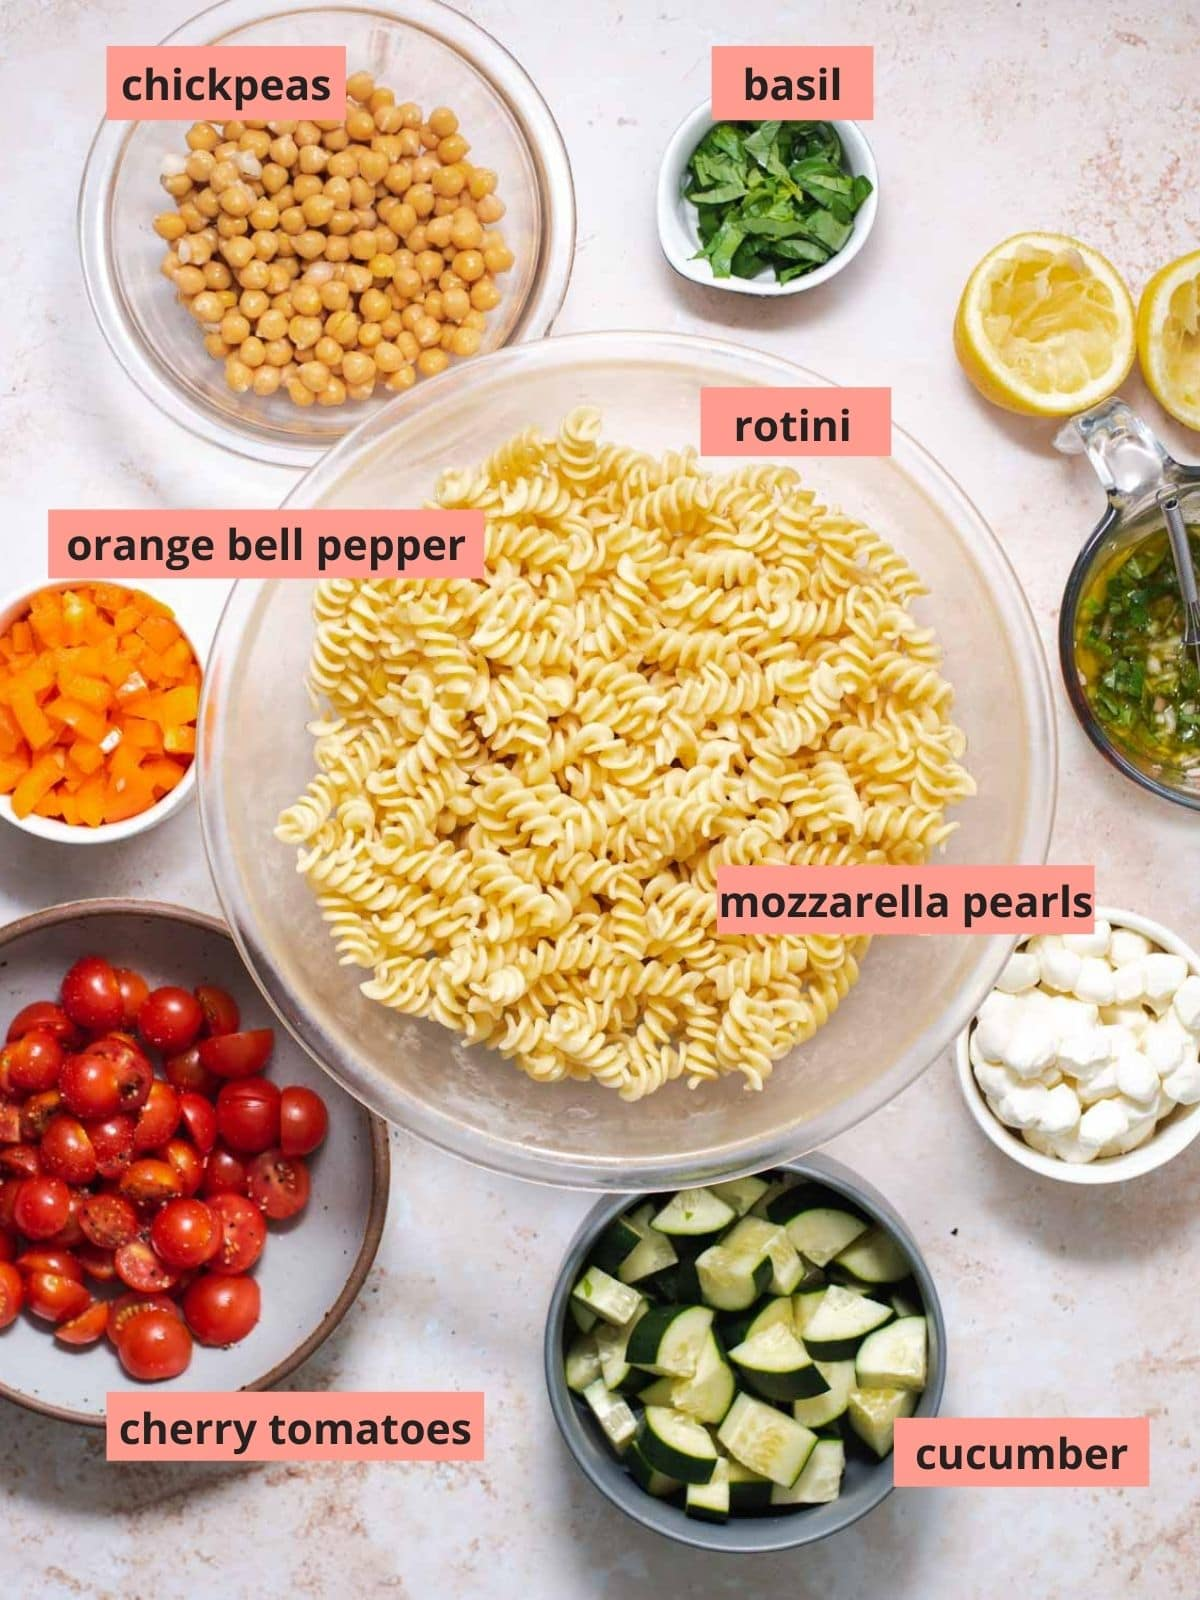 Labeled ingredients used to make pasta salad